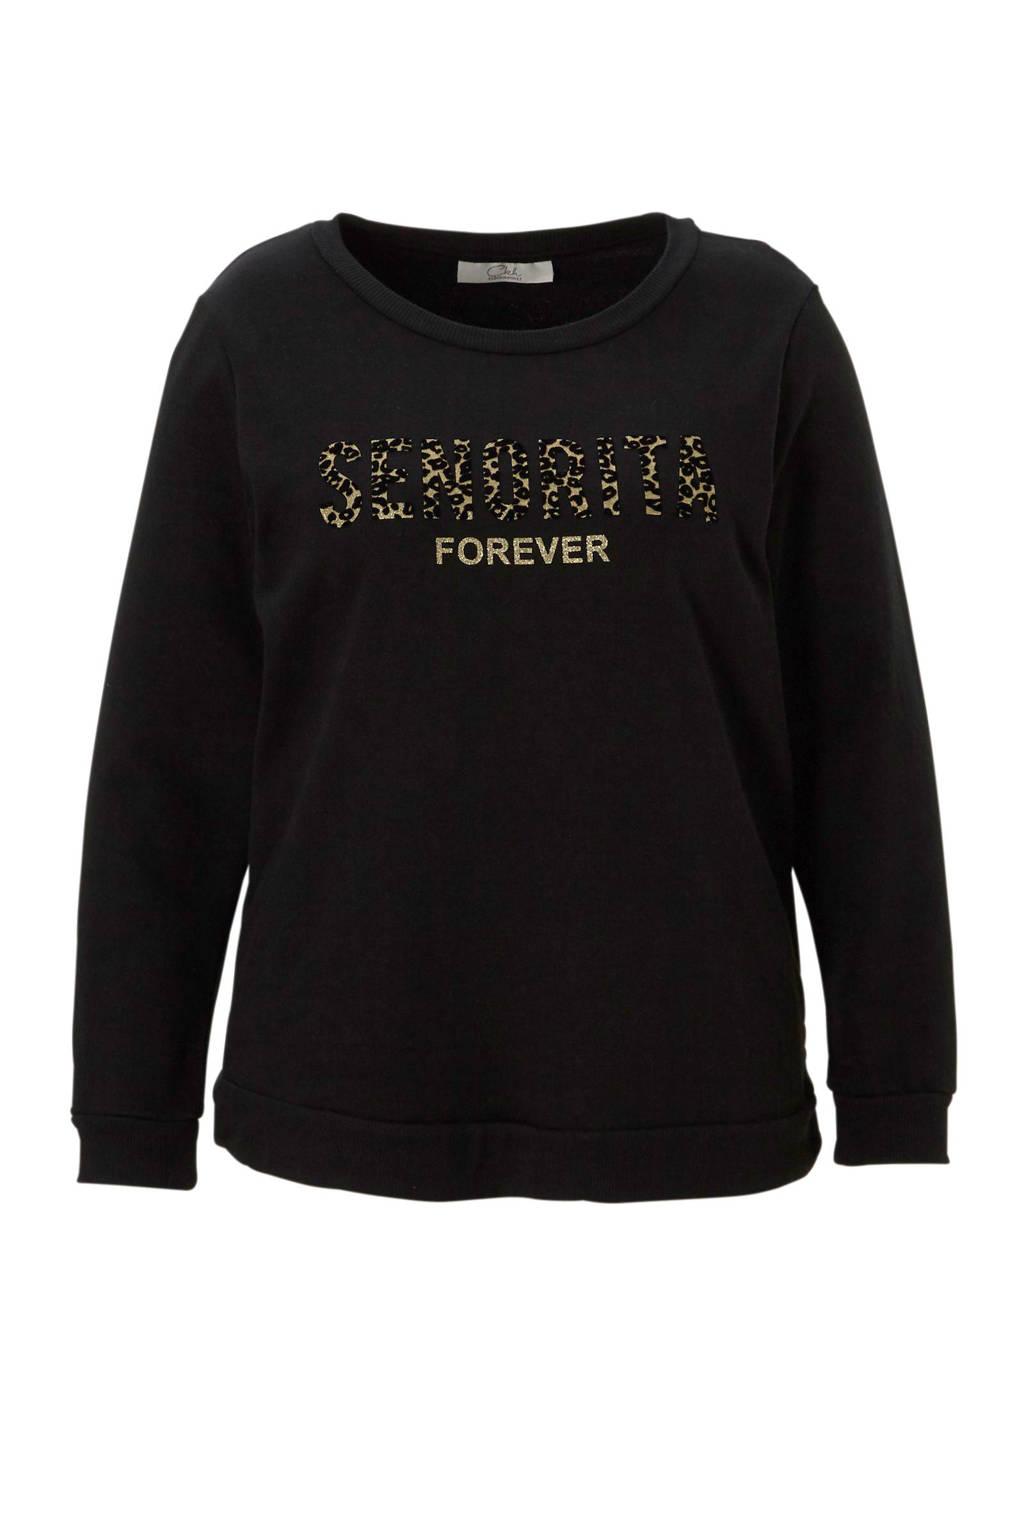 C&A XL Clockhouse sweater met letteropdruk zwart, zwart/ goud